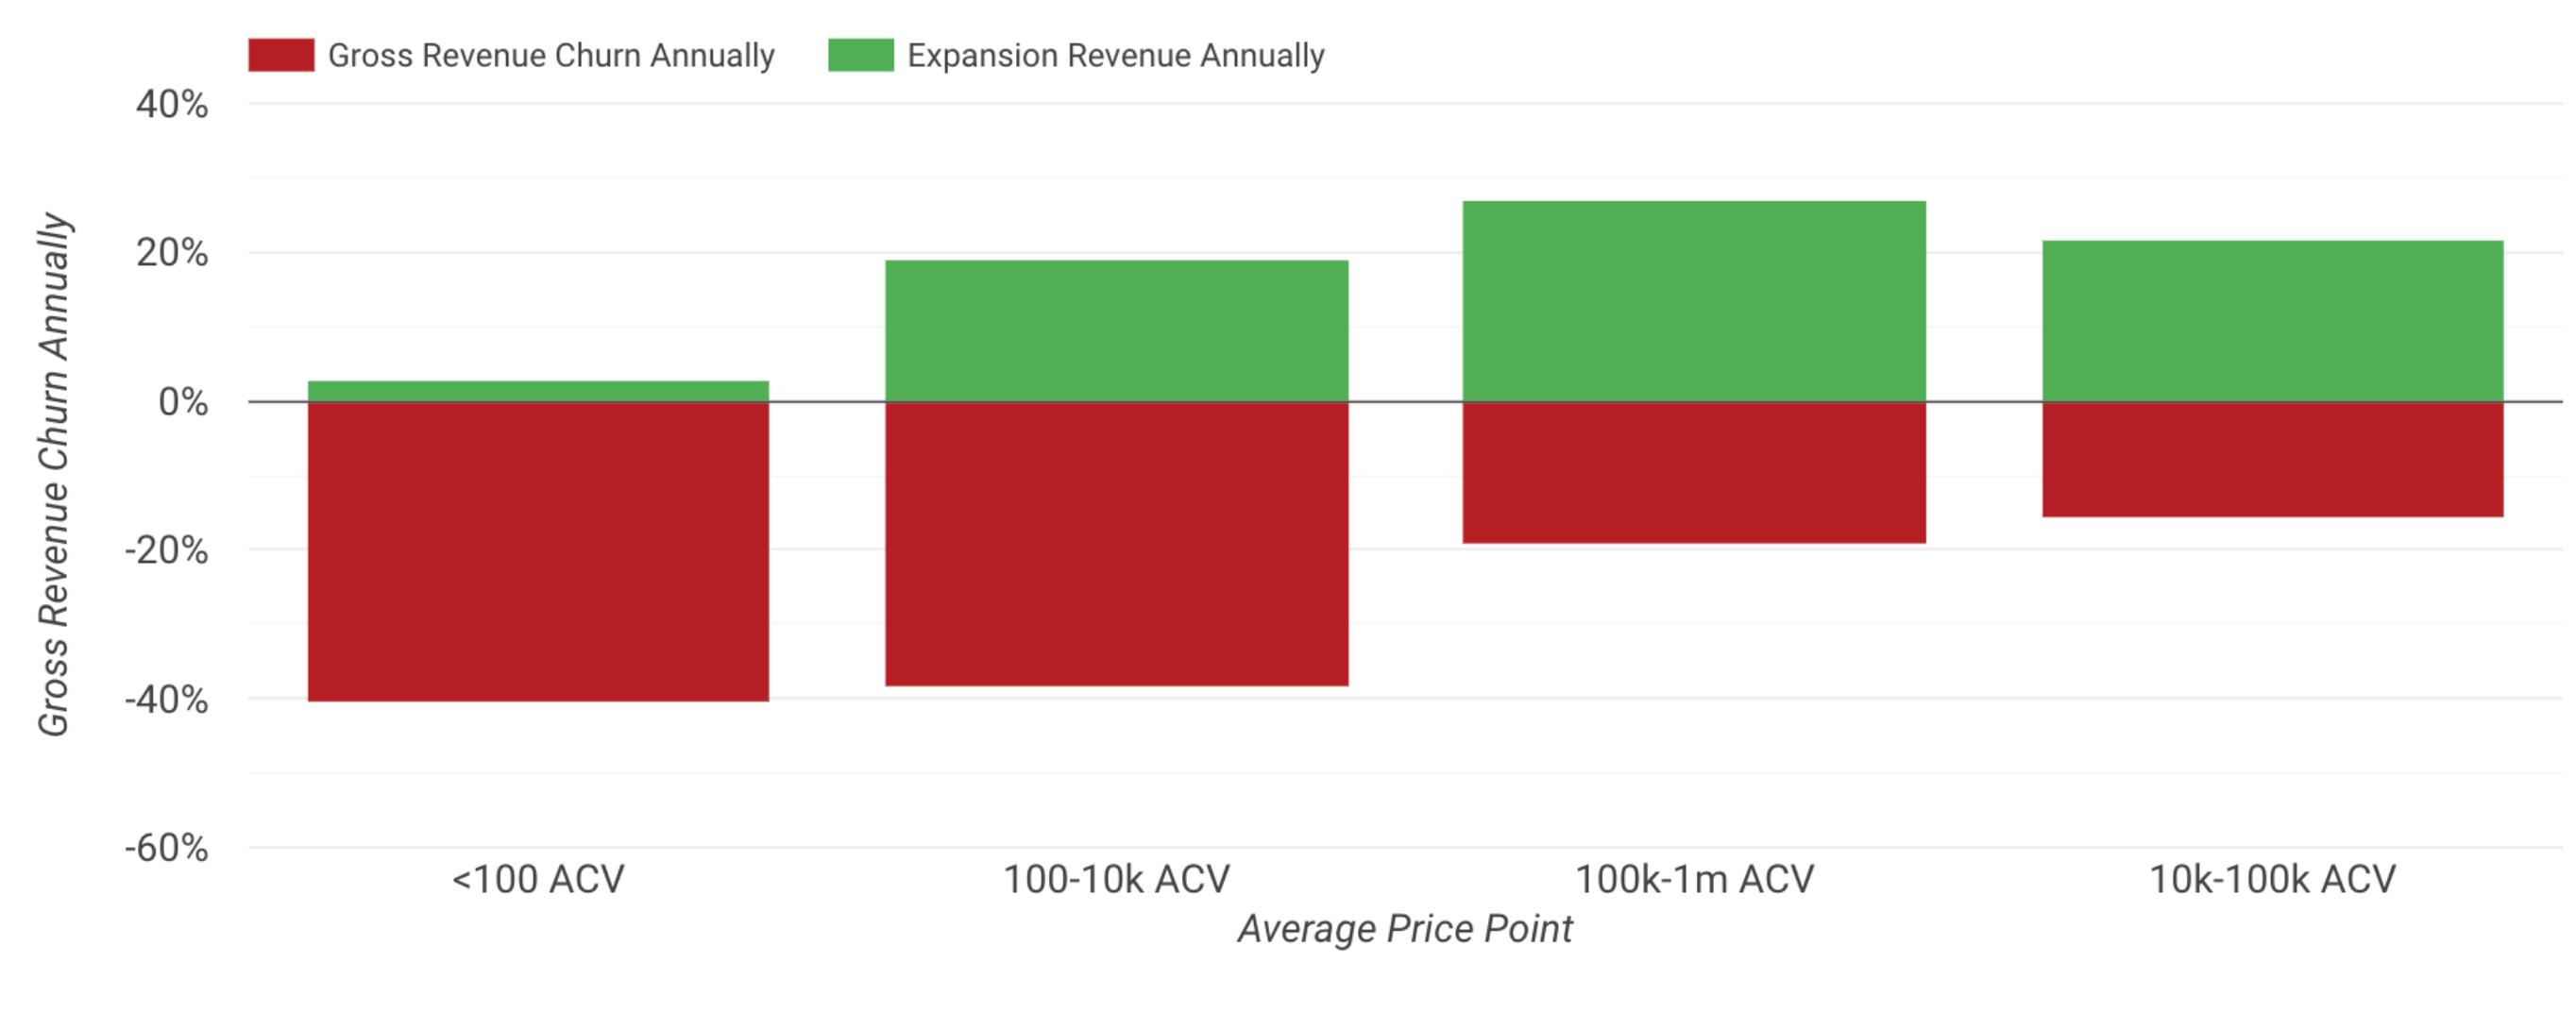 Gross Revenue Churn Annualy